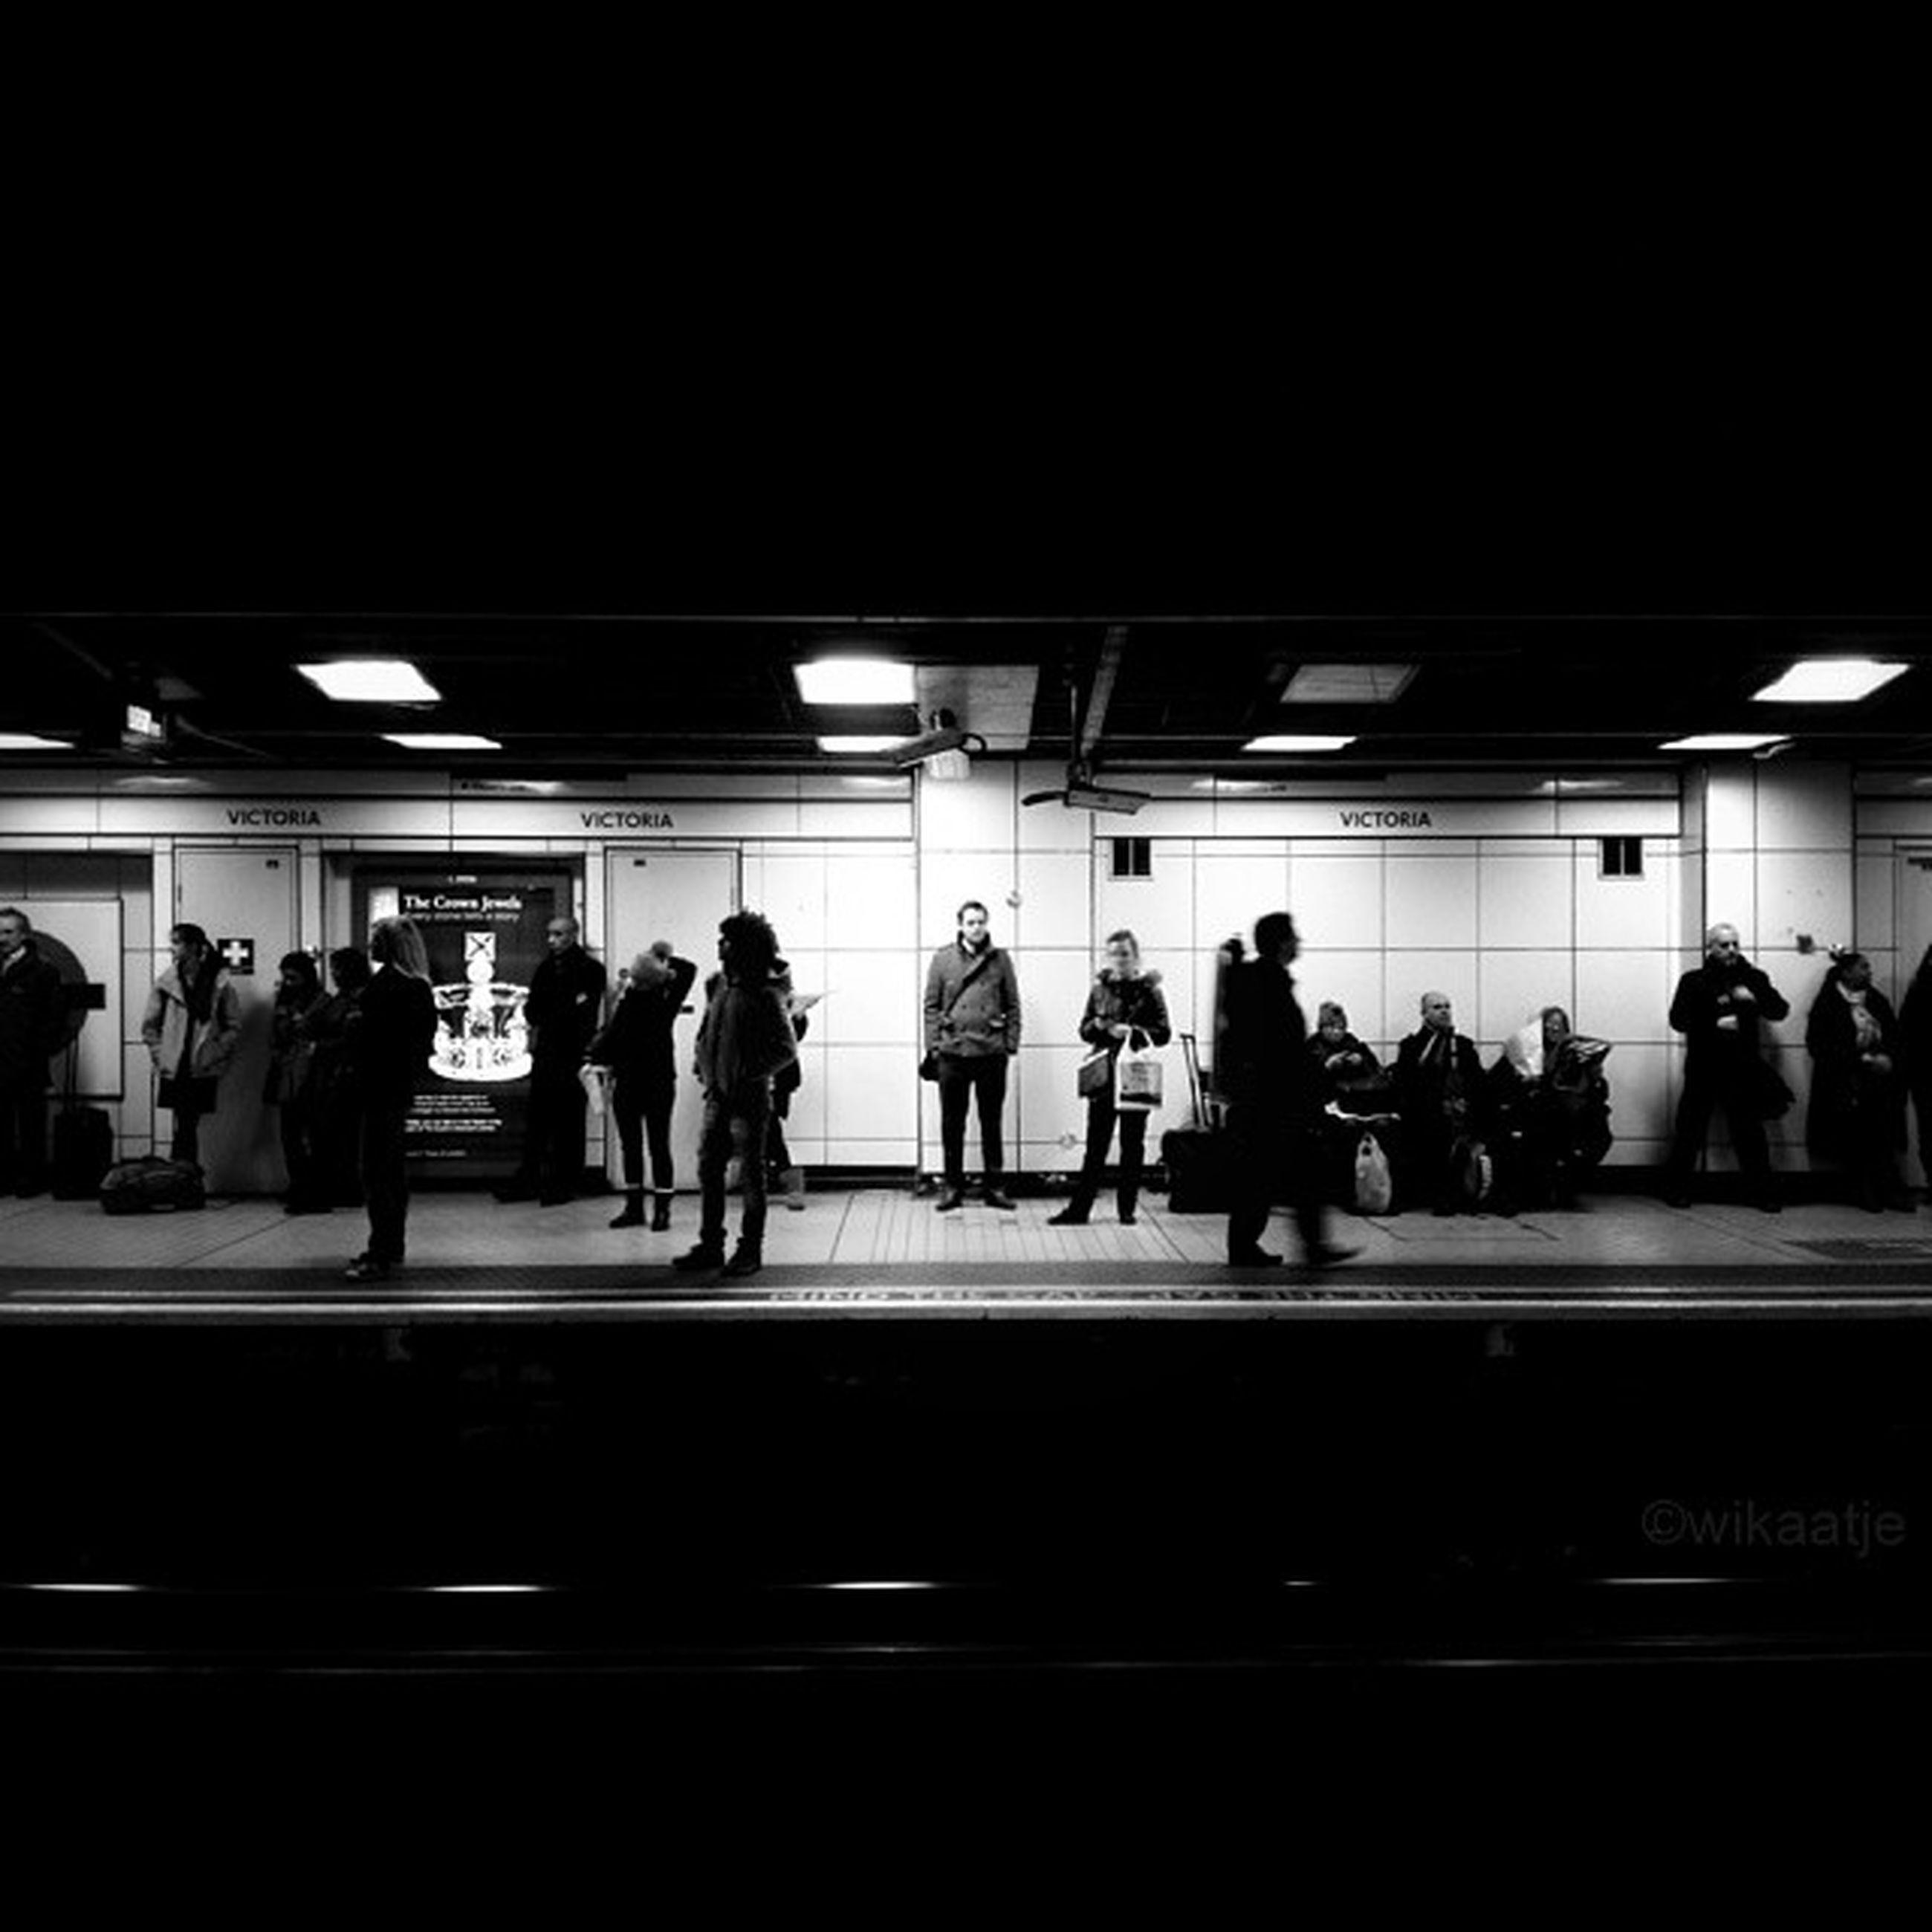 men, indoors, railroad station, transportation, public transportation, person, railroad station platform, illuminated, walking, subway station, large group of people, lifestyles, rail transportation, subway, passenger, architecture, built structure, waiting, travel